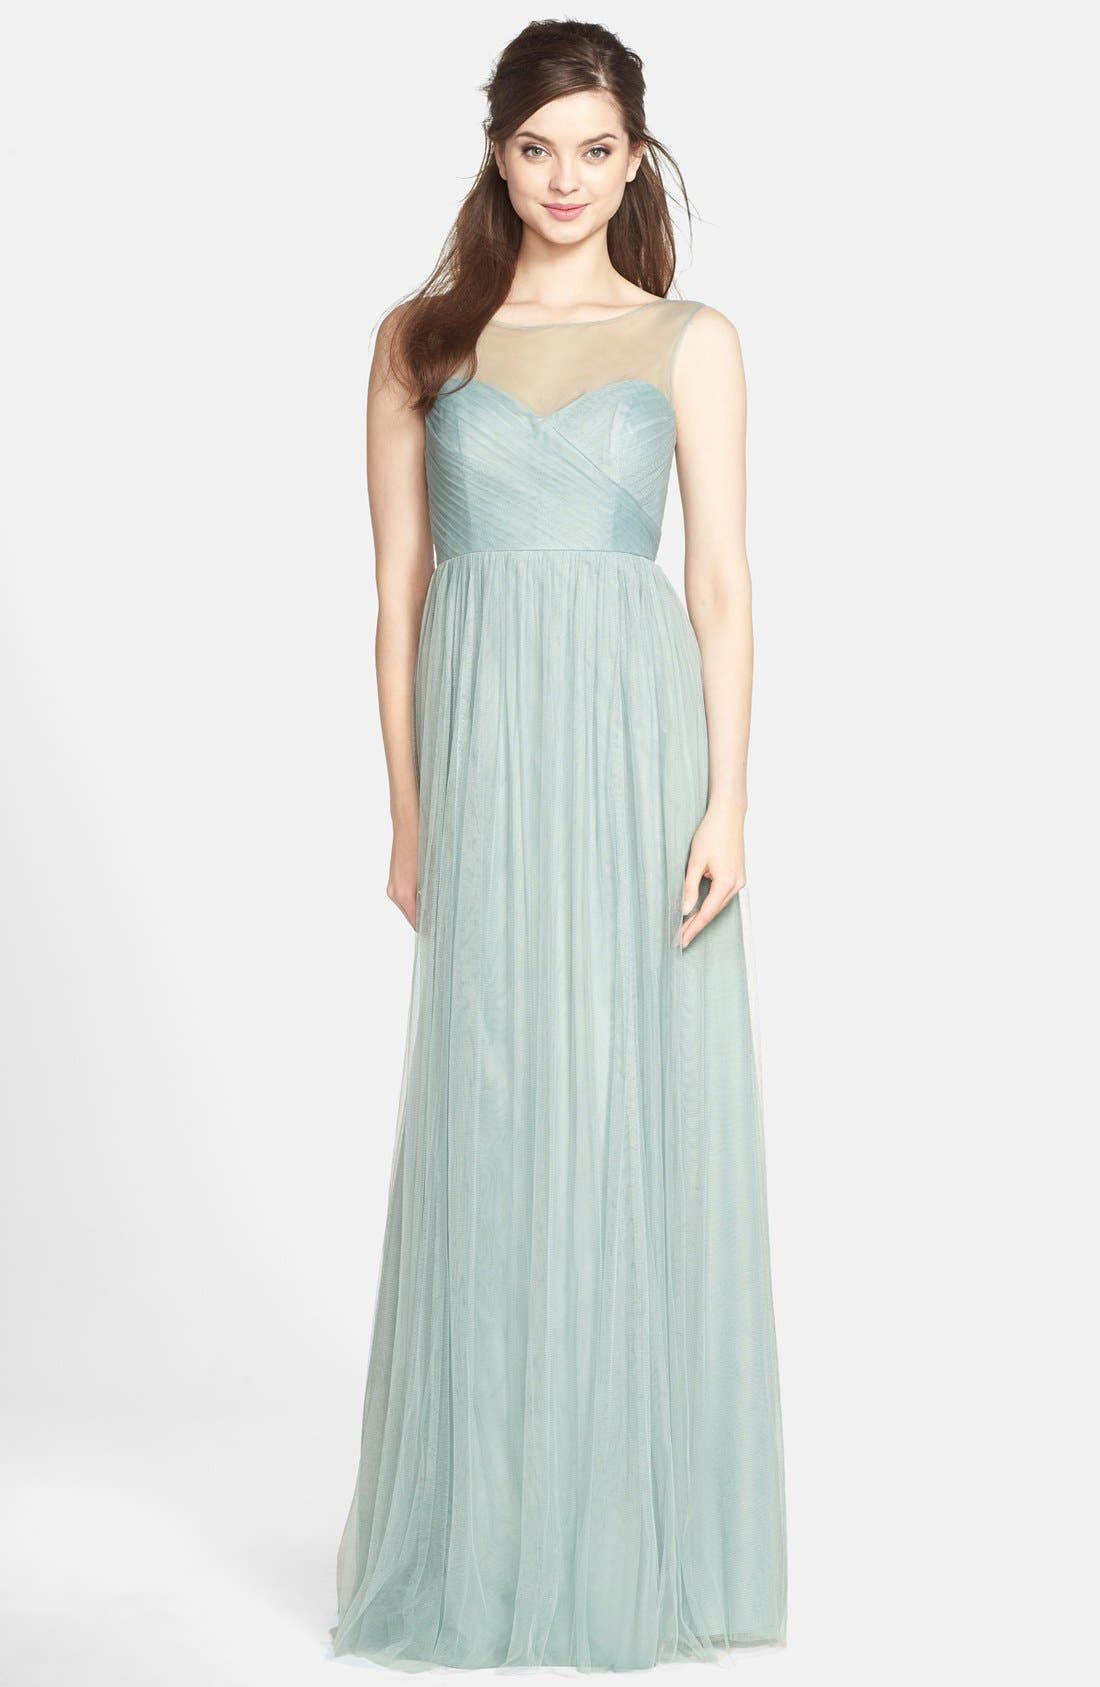 Magnificent Nordstroms Wedding Dress Ensign - All Wedding Dresses ...